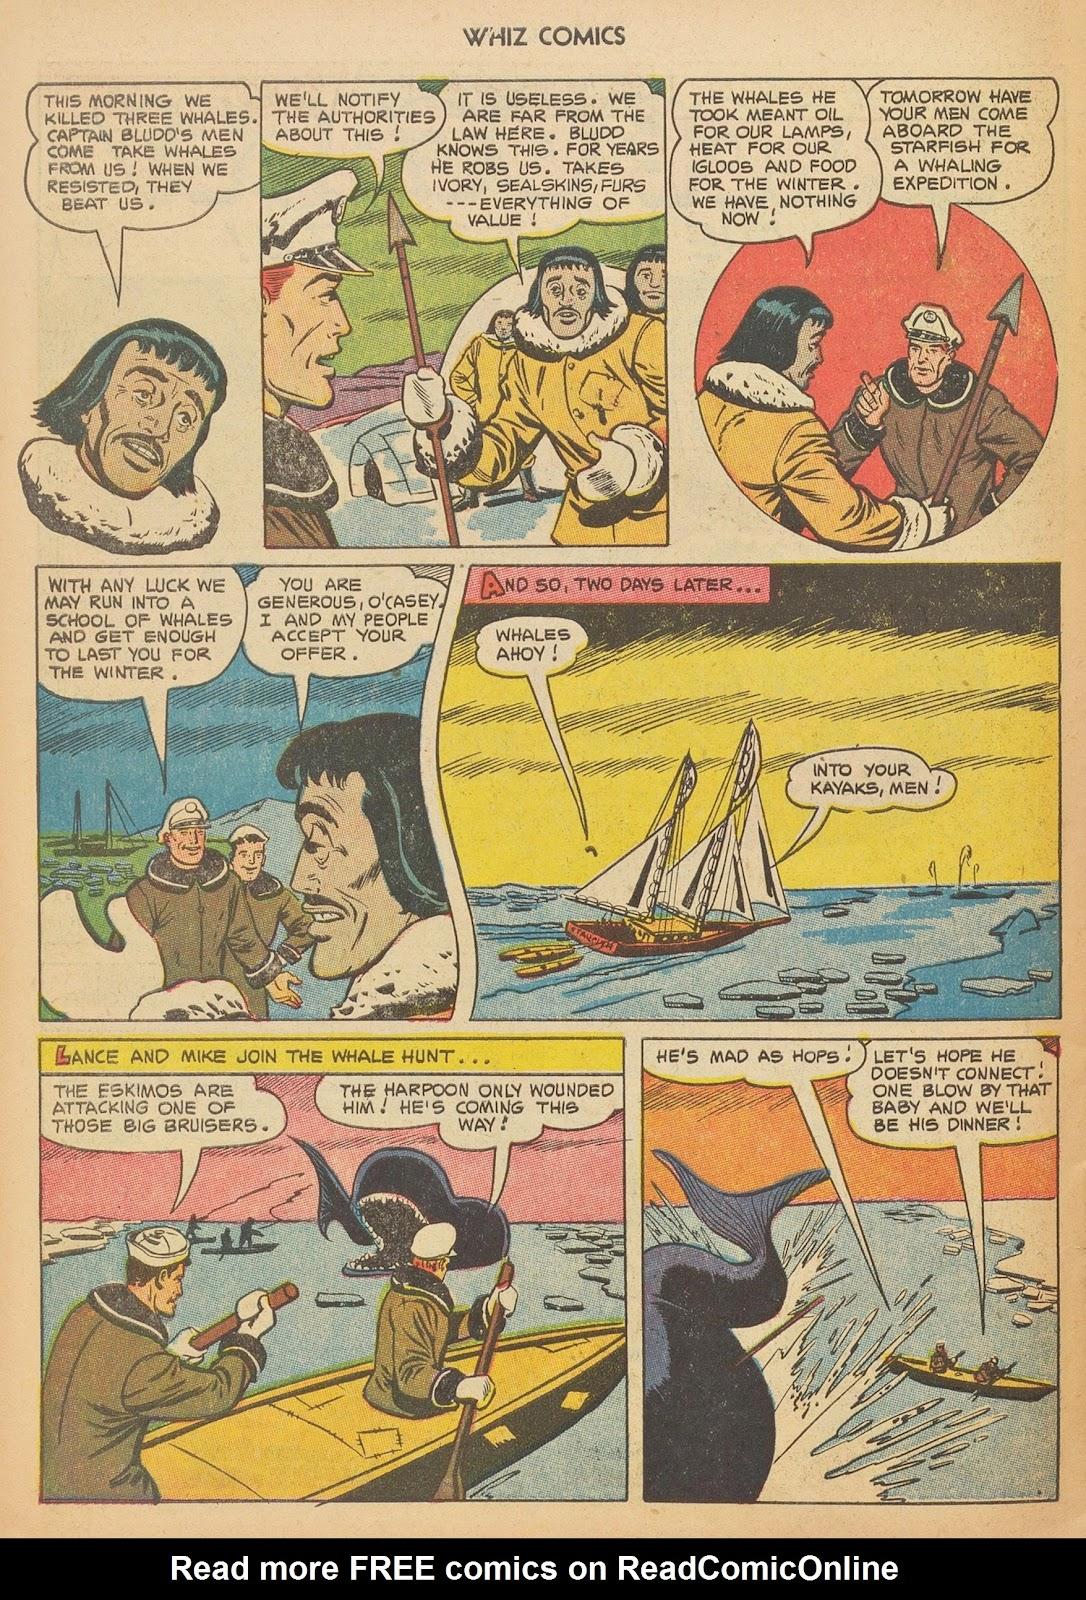 Read online WHIZ Comics comic -  Issue #153 - 30